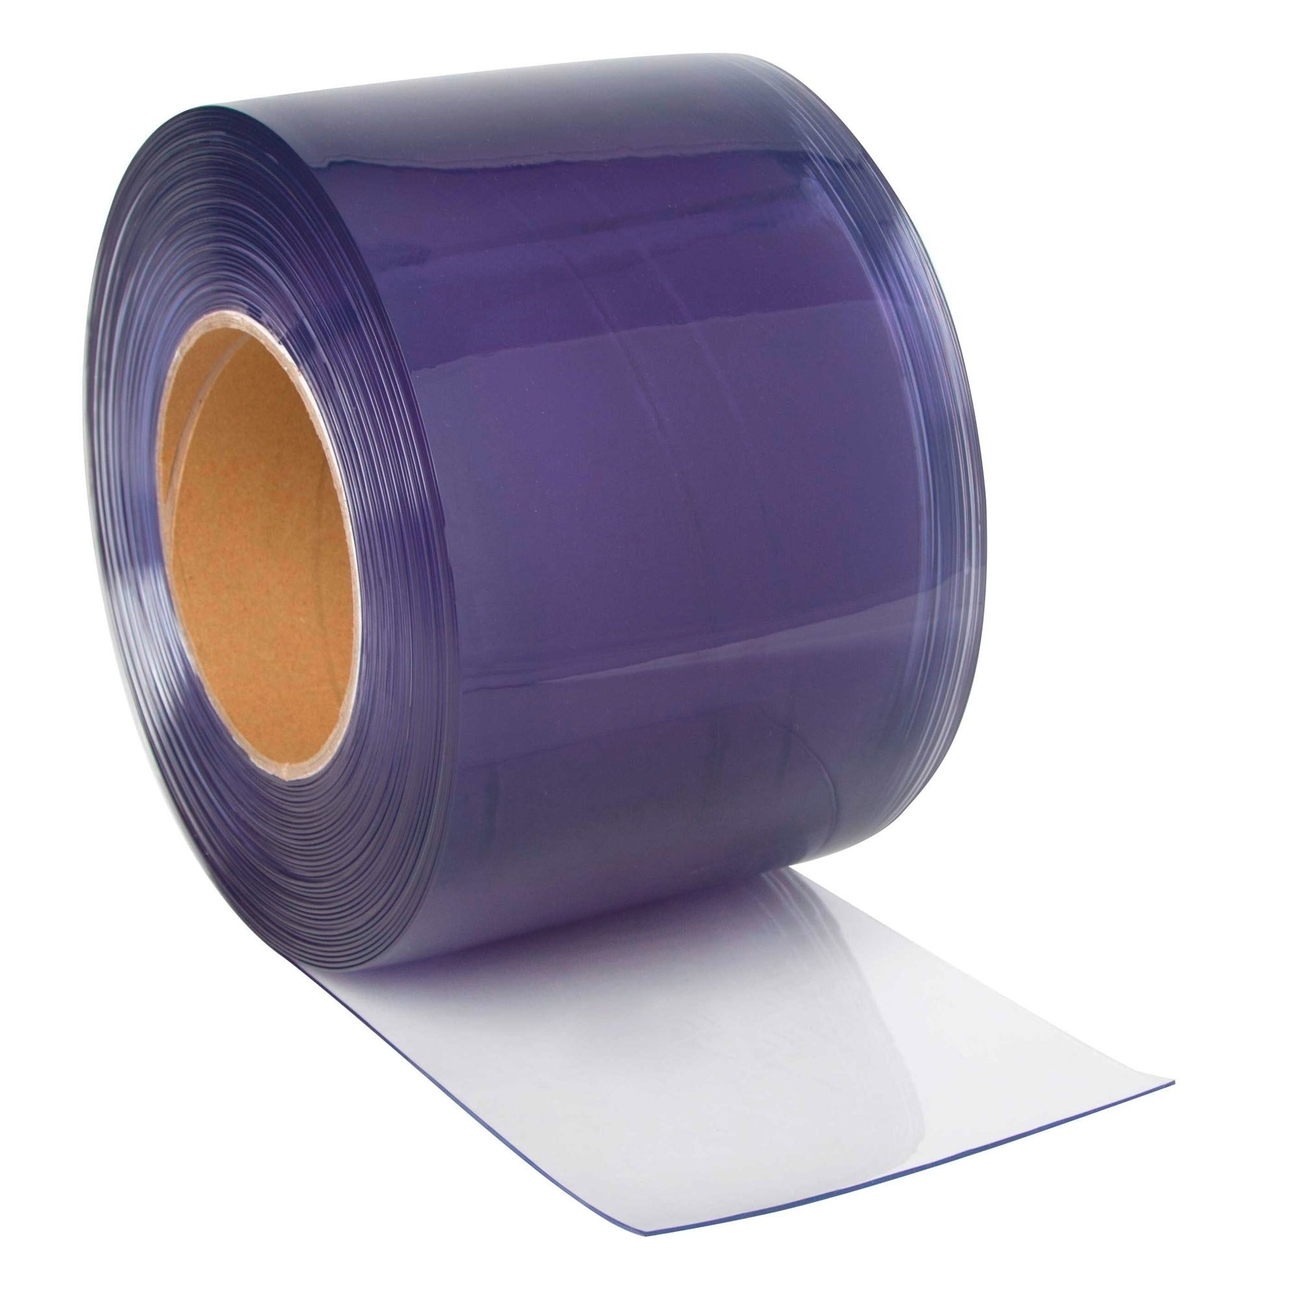 Kerbl PVC-Streifenvorhang, 30 cm x 3mm, 50m Rolle